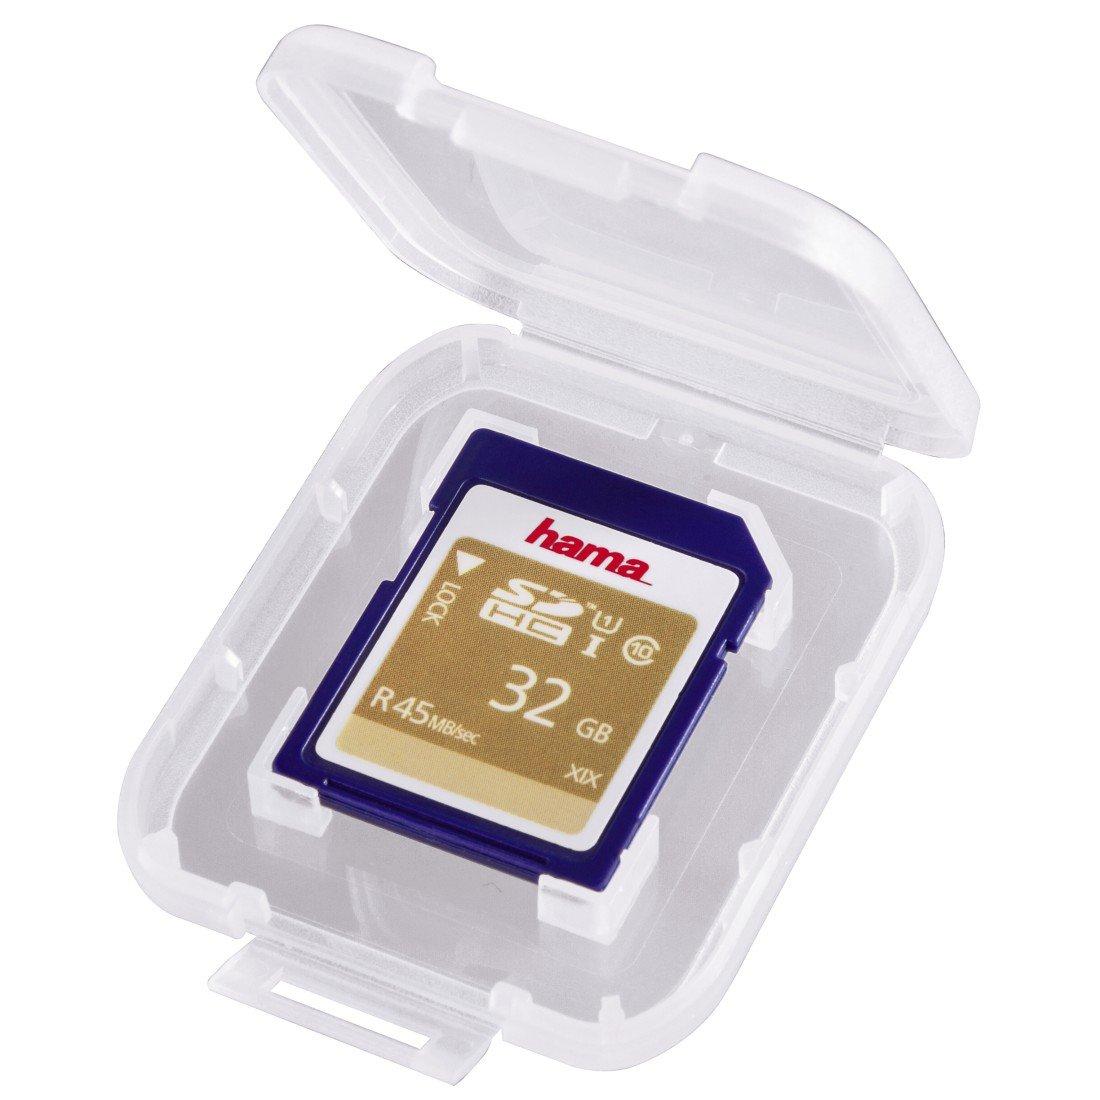 Hama Multimedia Card Box